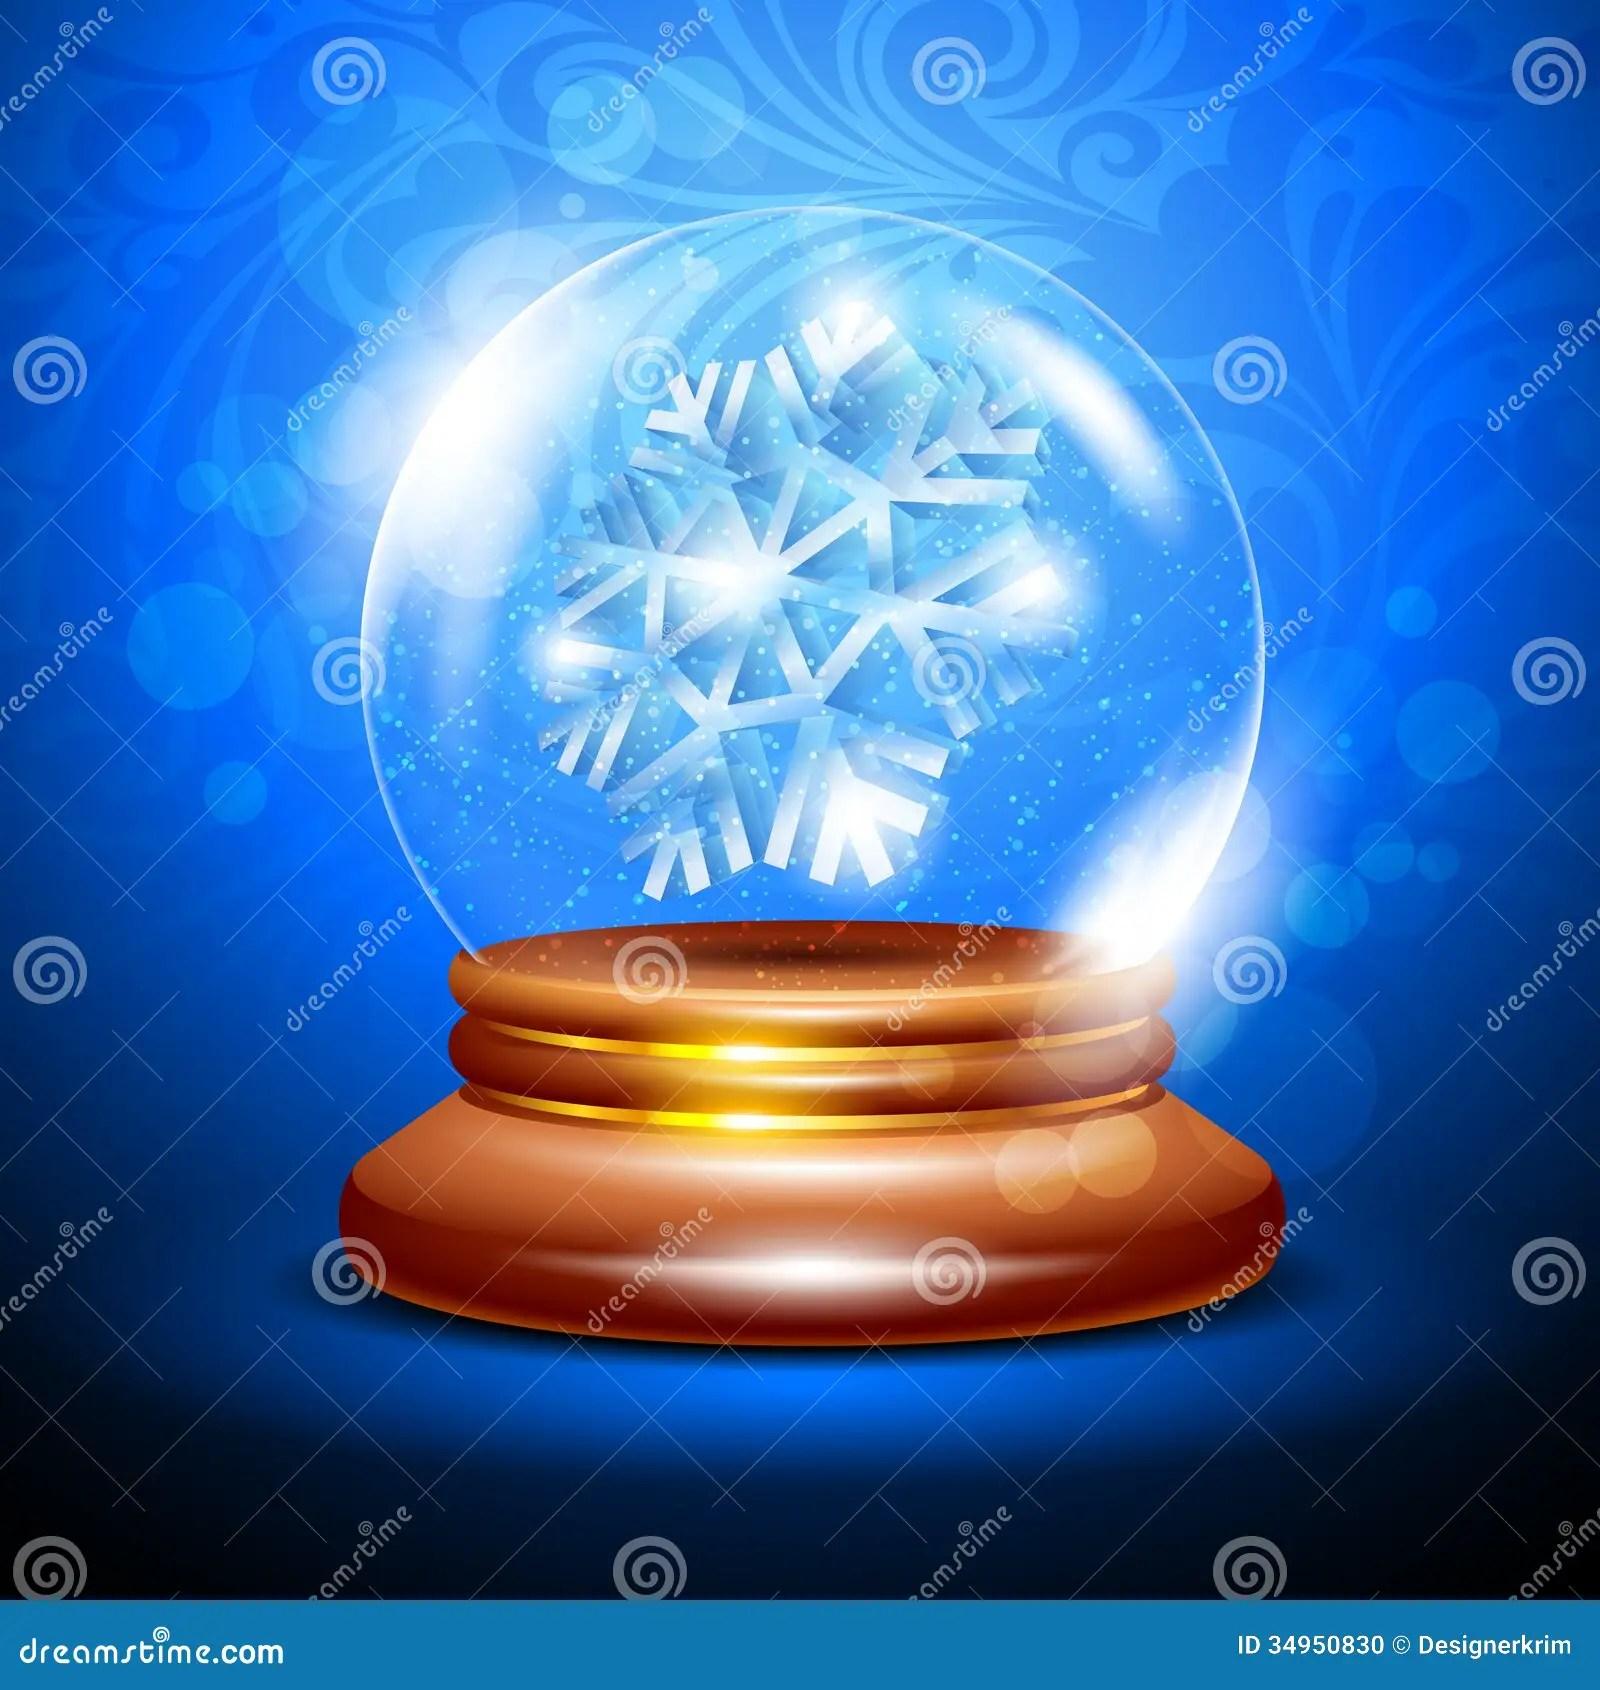 Christmas Snow Globe With A Snowflake Stock Photo Image